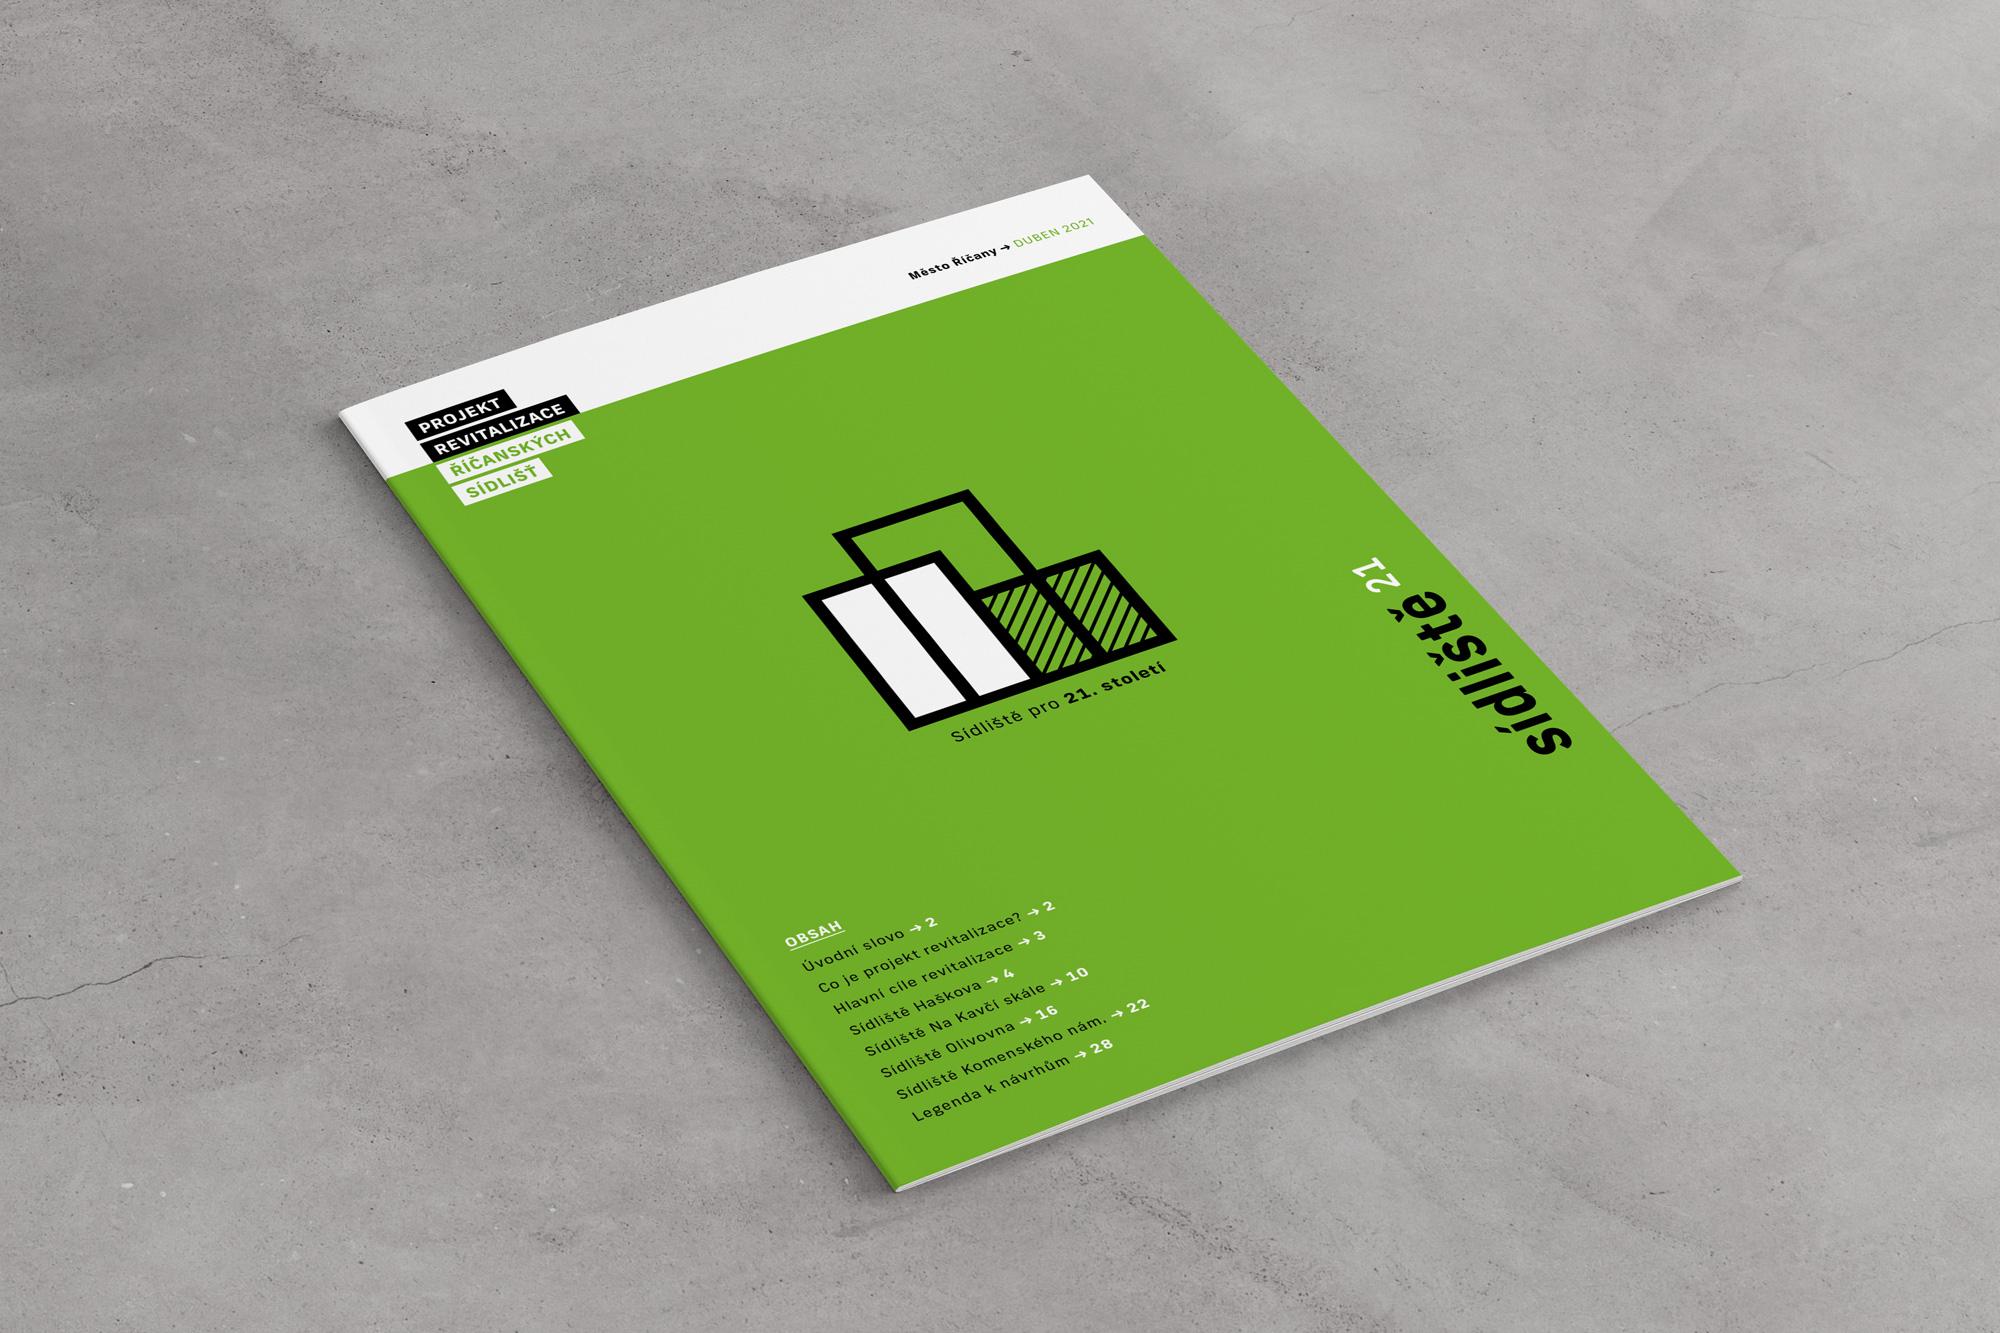 [album/Products_Model_Product/139/Sidliste_brozura_obalka.jpg]